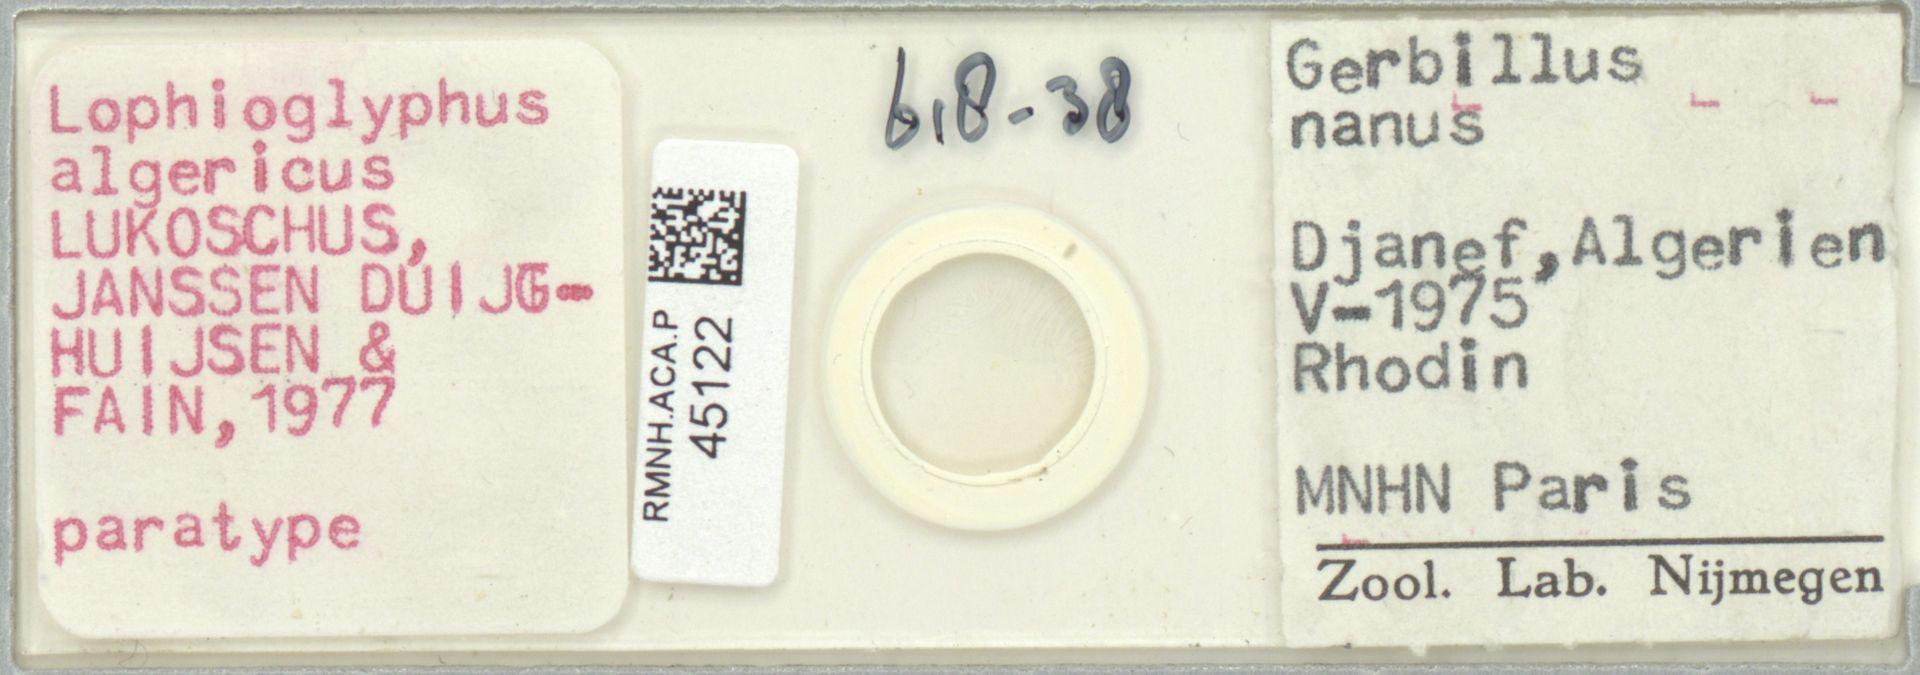 RMNH.ACA.P.45122 | Lophioglyphus algericus Lukoschus, Janssen Duijghuijsen & Fain, 1977